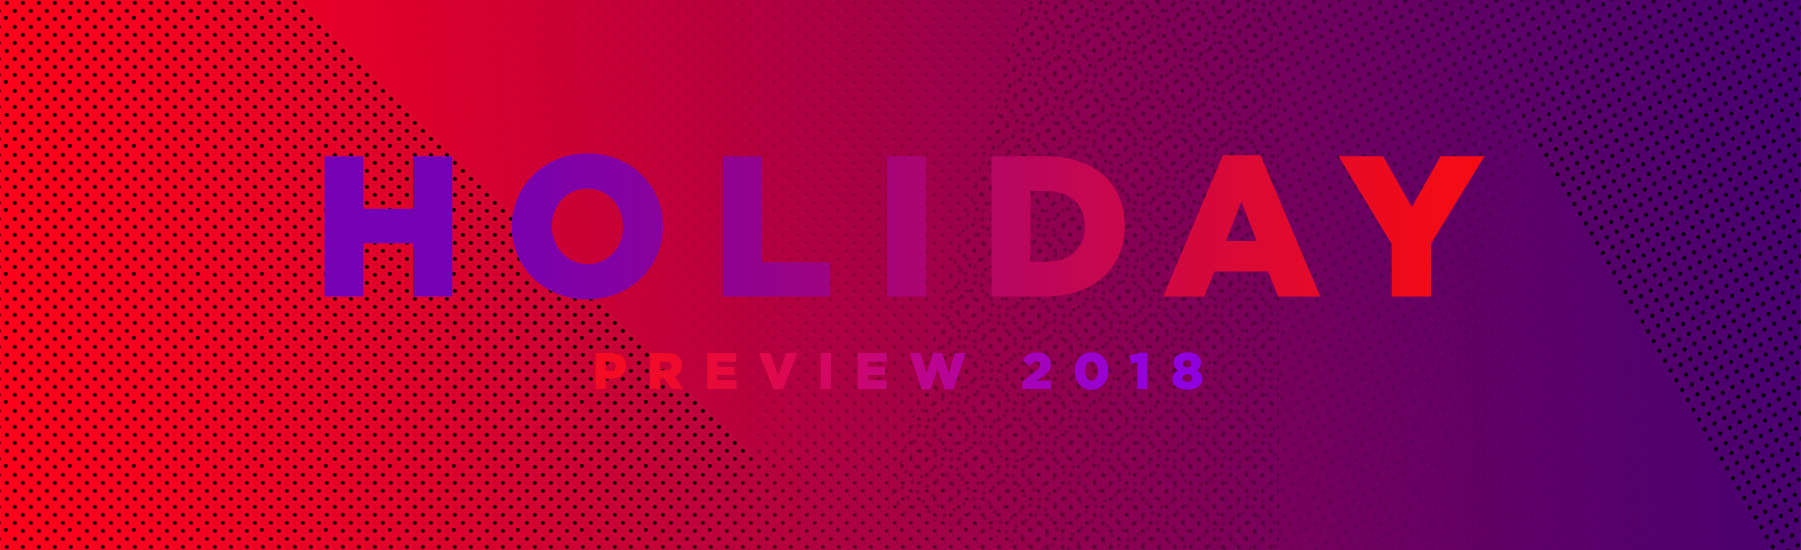 2018 Men's Holiday DrJays.com